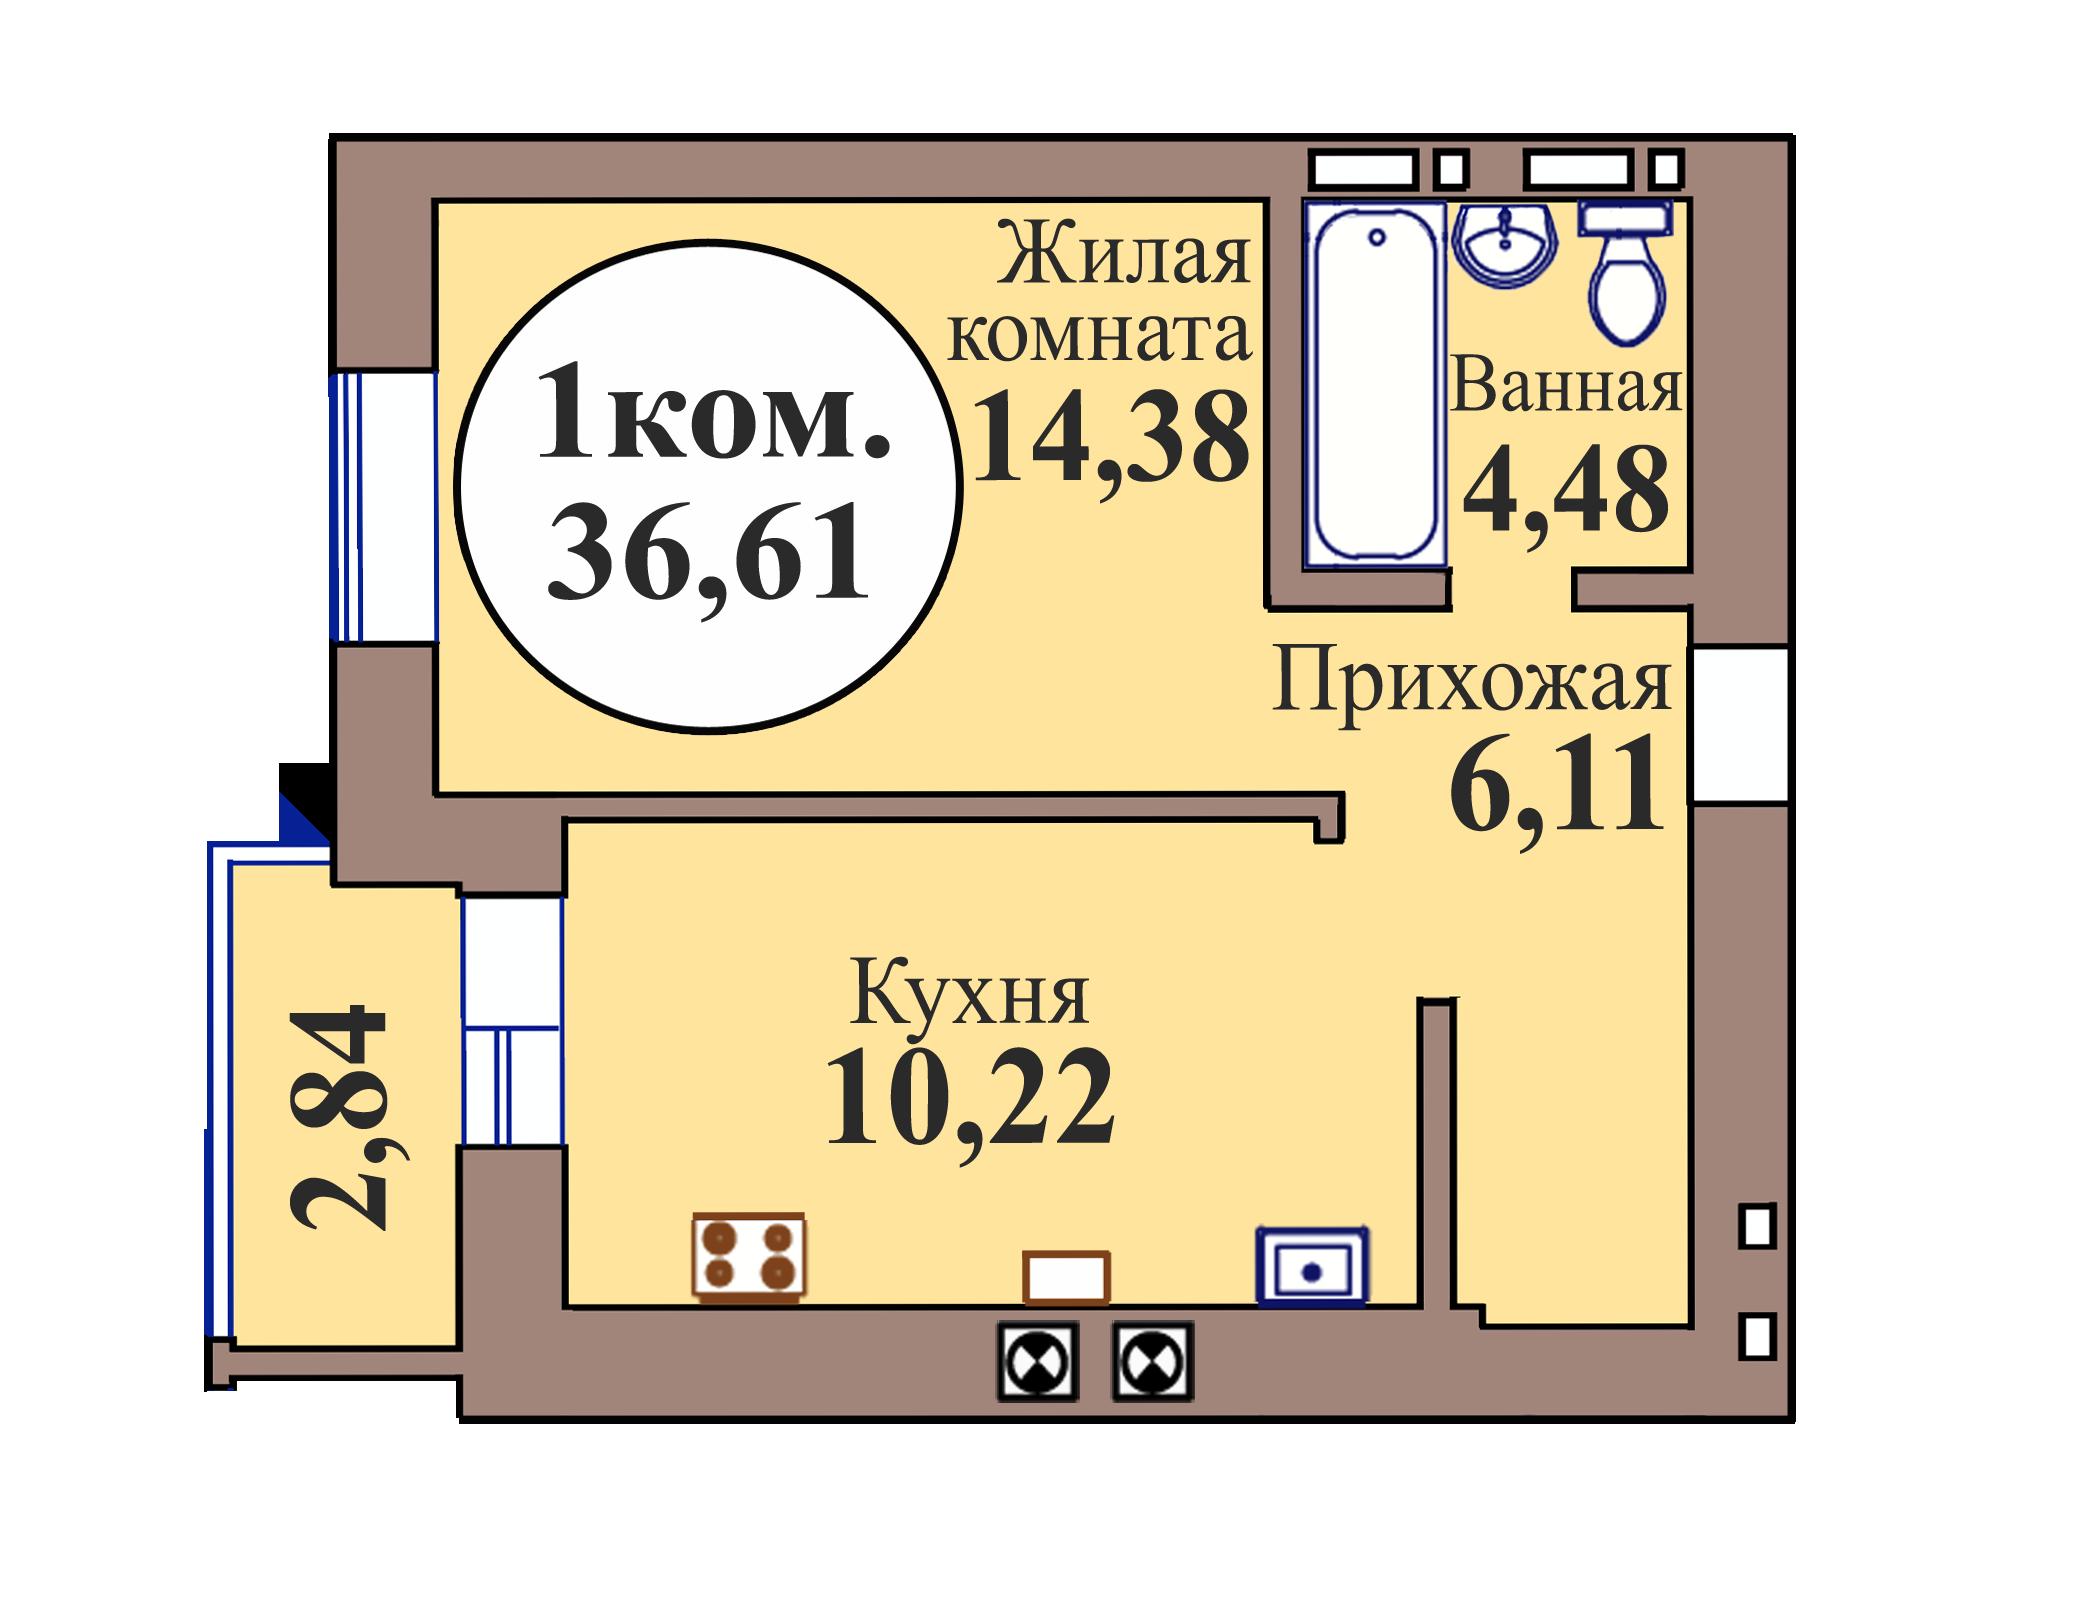 1-комн. кв. по ГП дом №3, МКР Васильково, кв. 190 в Калининграде